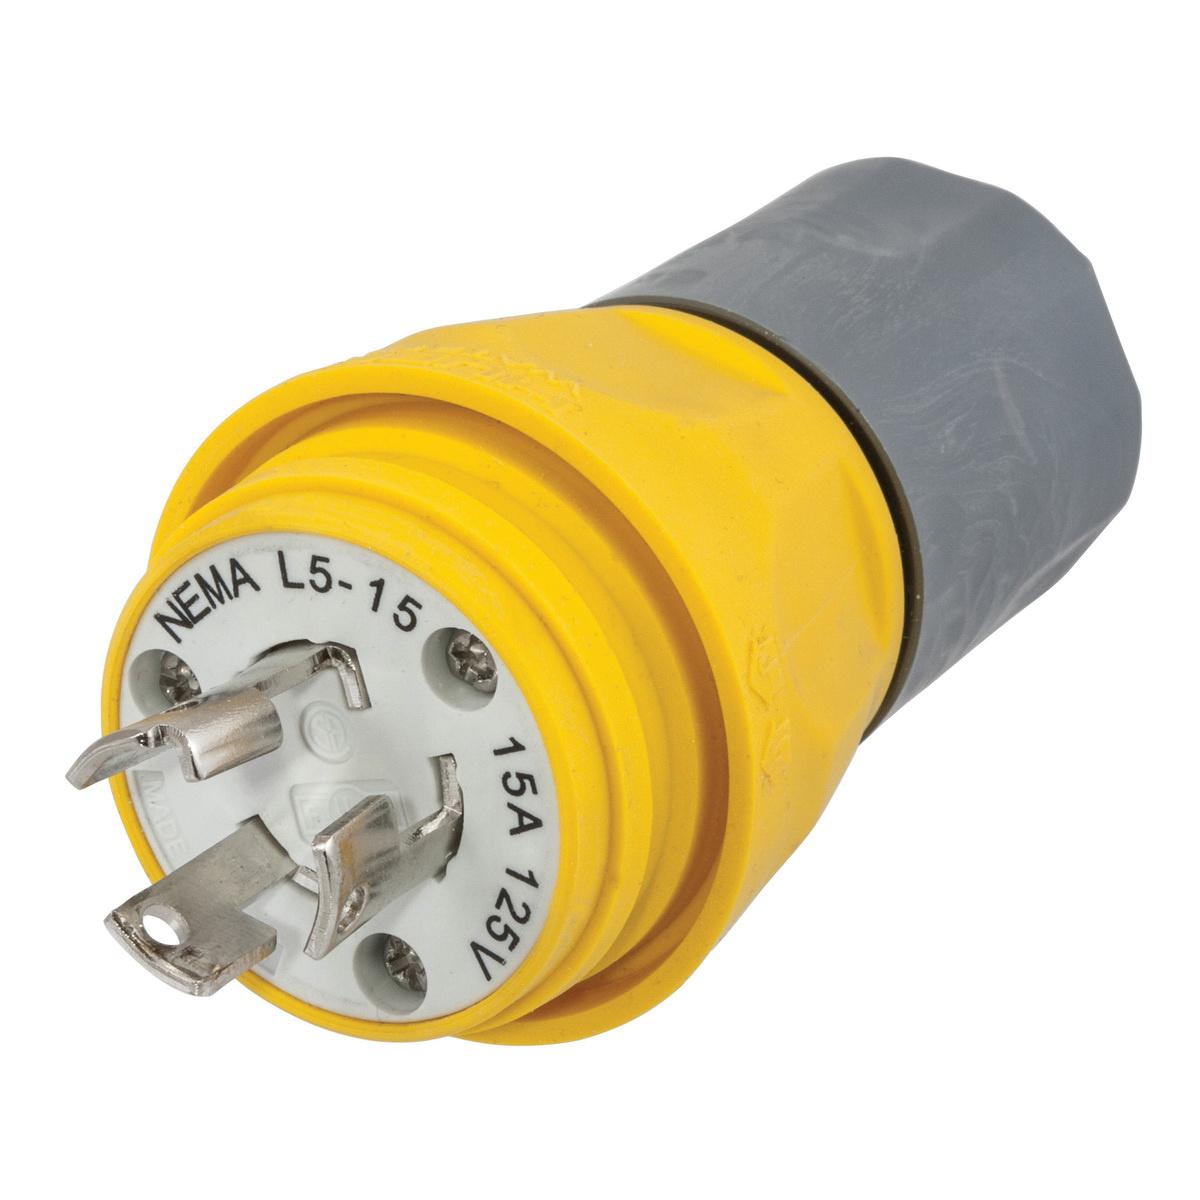 Hubbell HBL24W47A Watertight Plug Nema L5-15 15-amp 125-volt 2-pole 3-wire